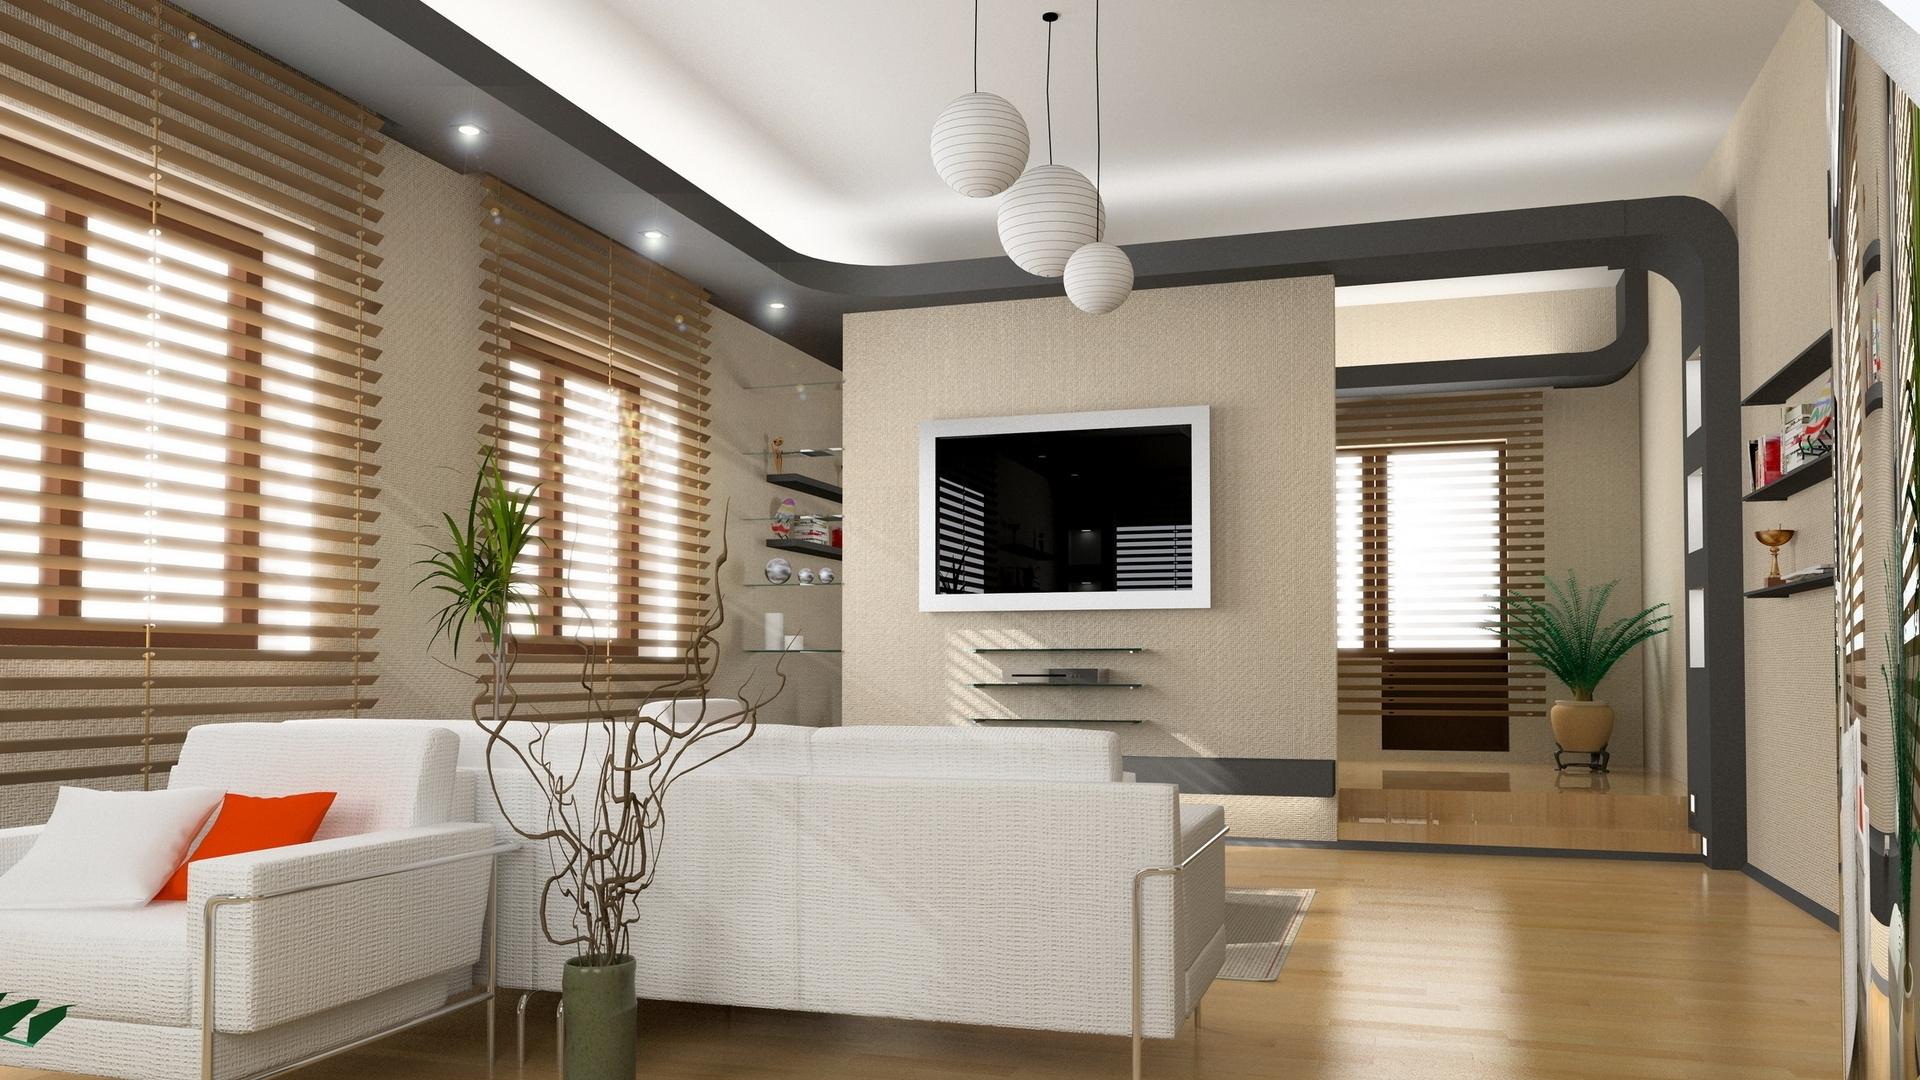 overwhelming-home-design-hd-hd-beautiful-interior-home-design-wallpaper-download-free-home-design-hd-l-c9842473f4c95059.jpg